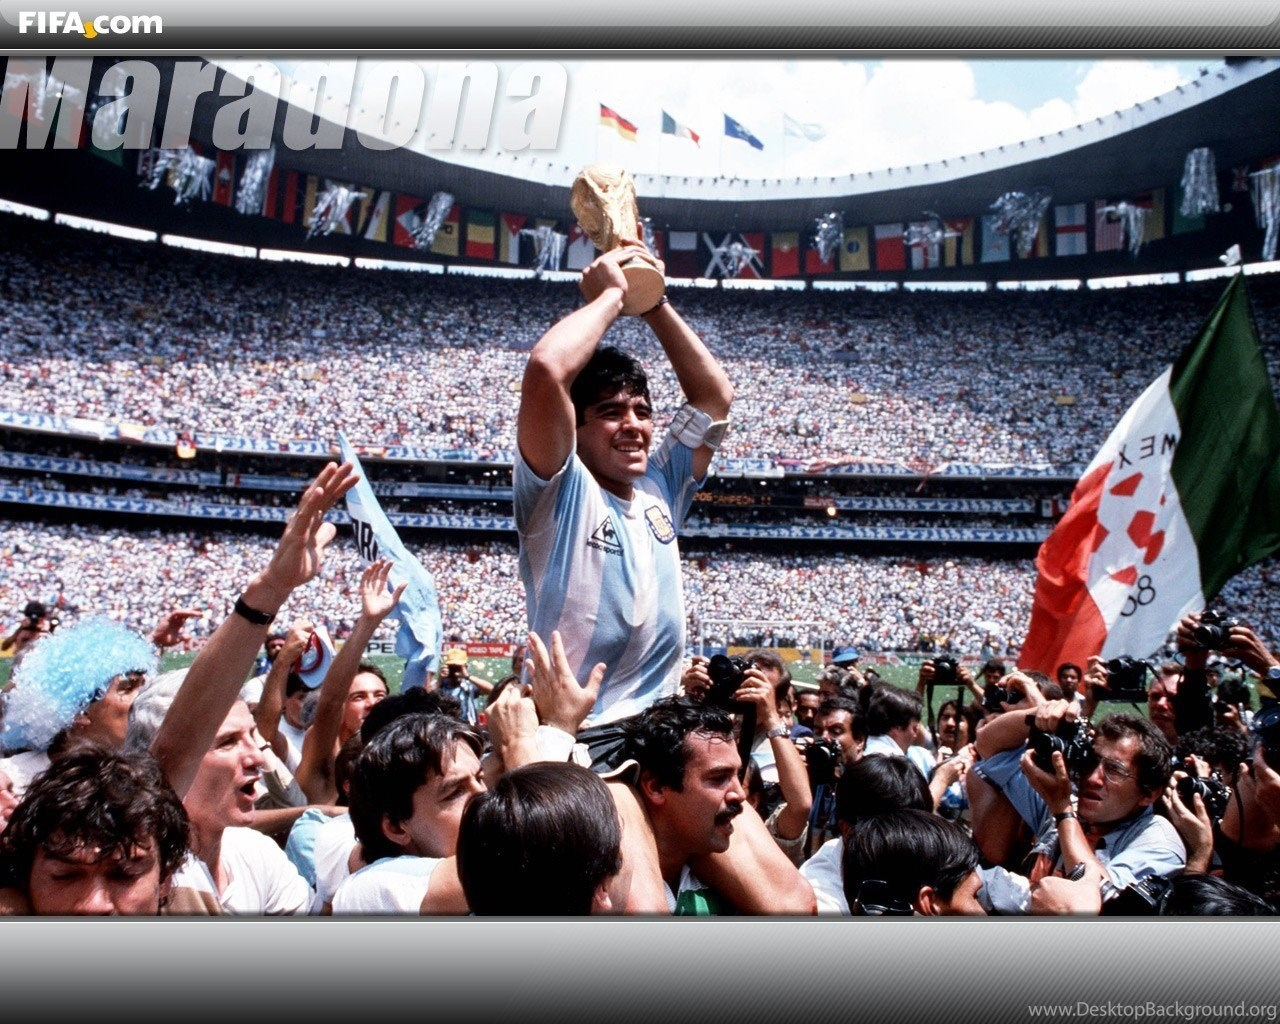 Soccer Girls Wallpaper Free: Soccer Girls Love Diego Maradona Football Player